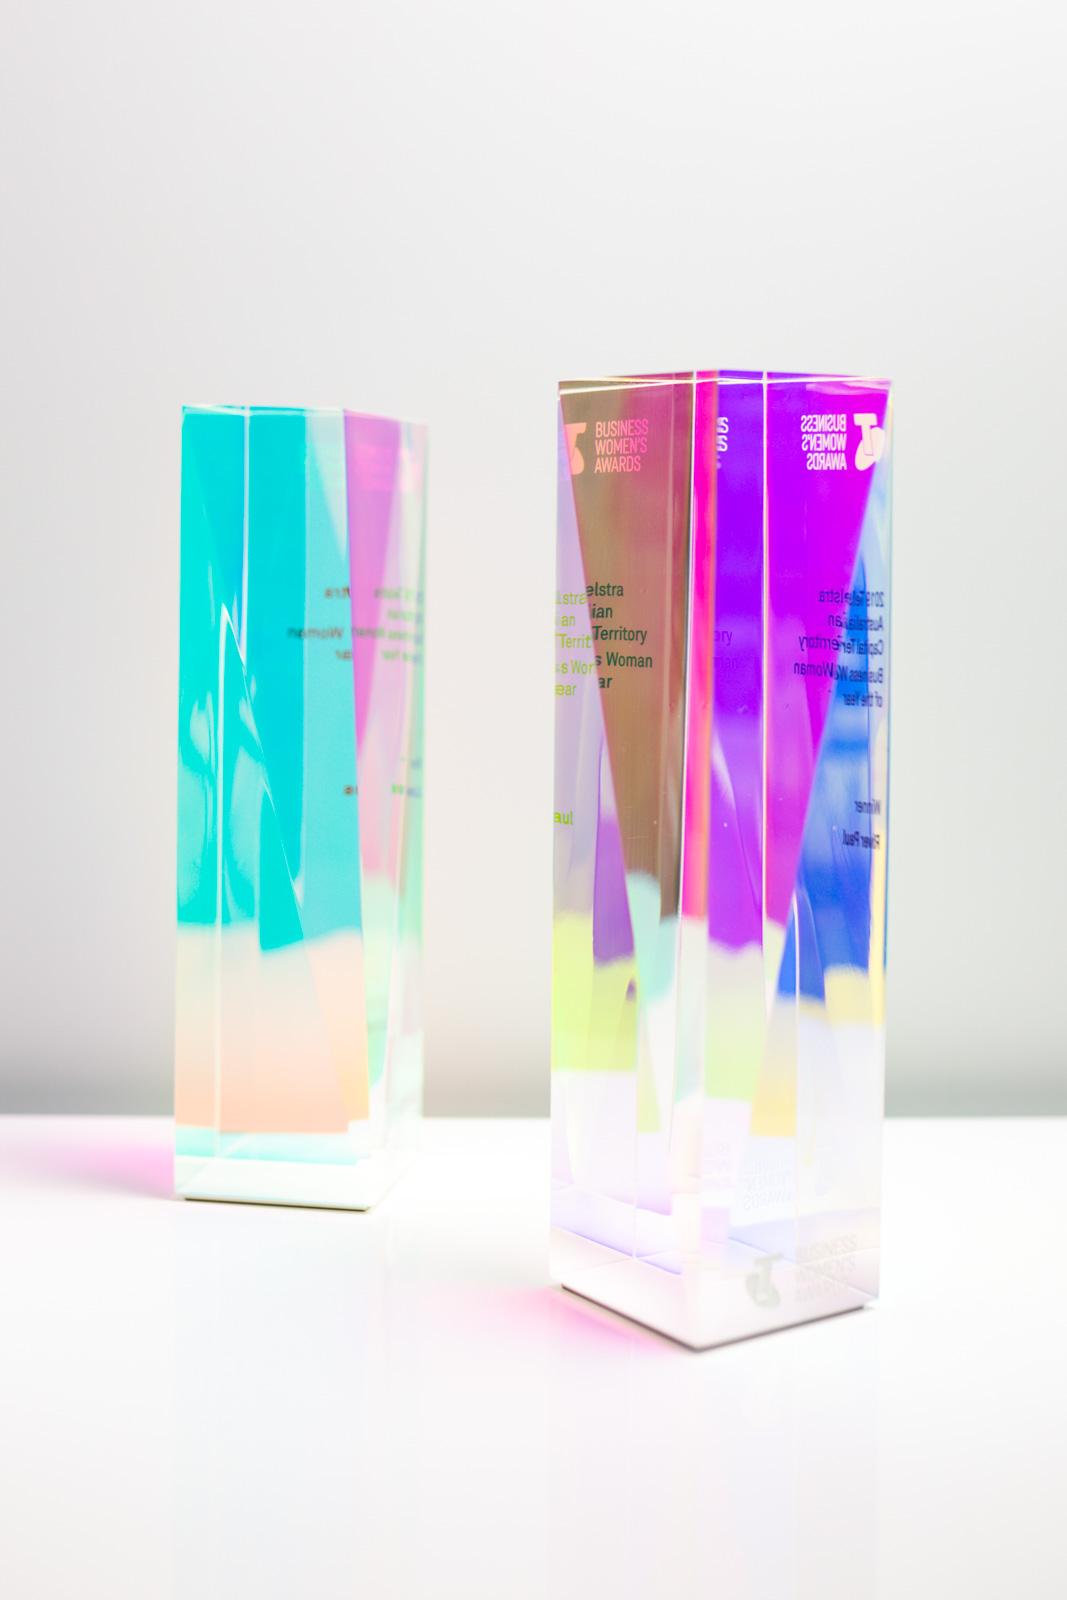 Telstra Business Women's Awards